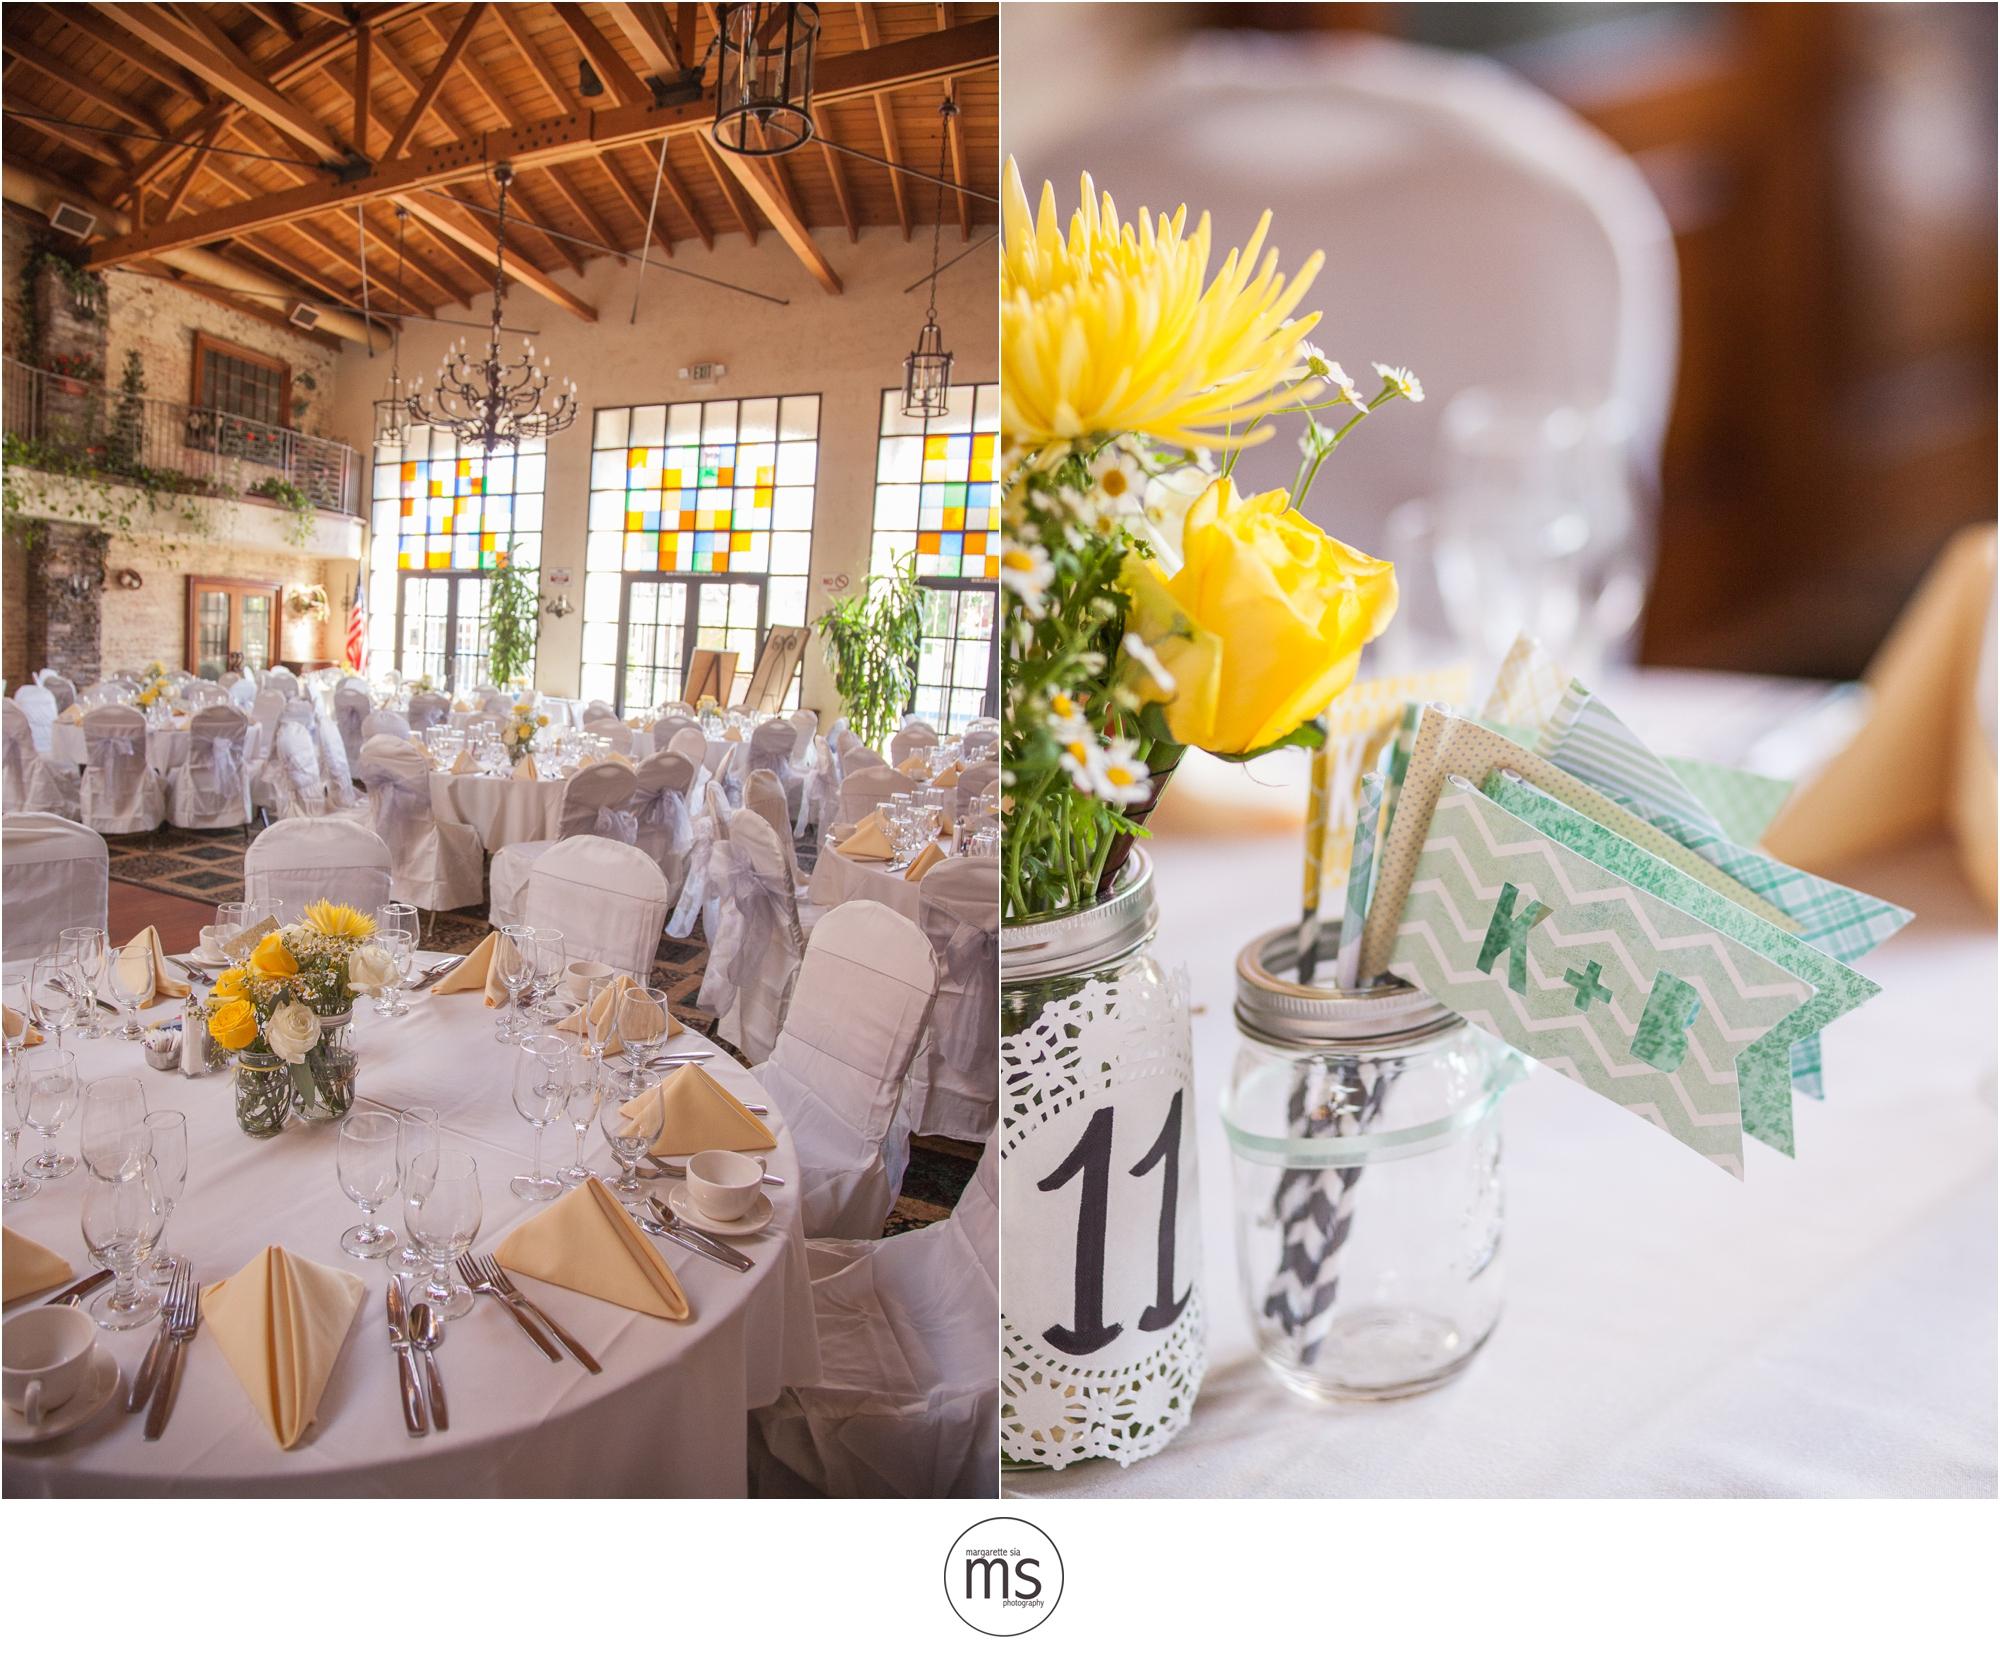 ... Photography_0004 Brian U0026 Kaman Wedding Michaelu0027s Tuscany Room San Pedro  CA Margarette Sia Photography_0002